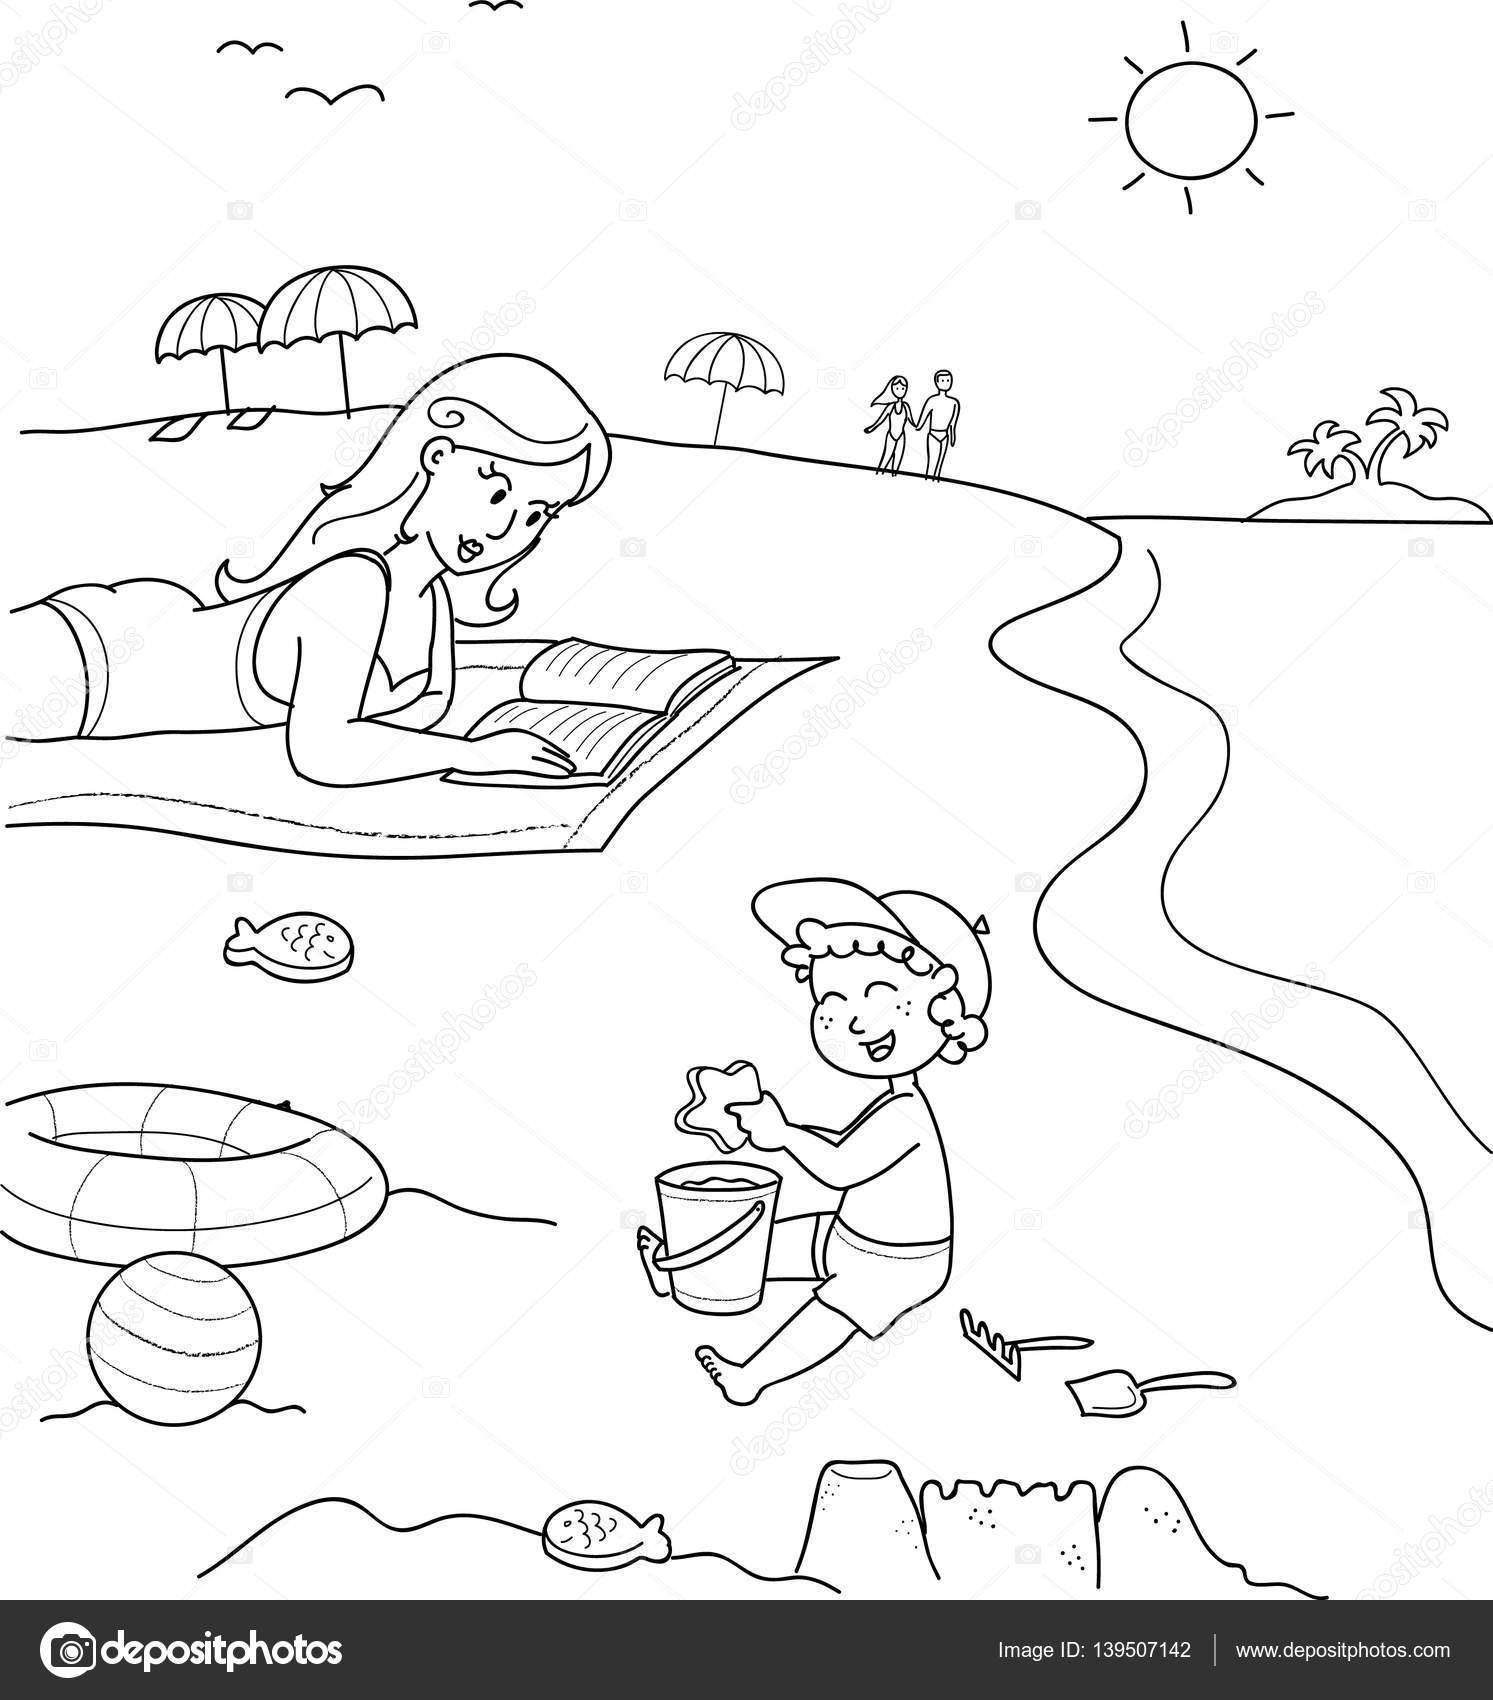 Dibujos Madre E Hijo Para Pintar Colorear Madre E Hijo En La